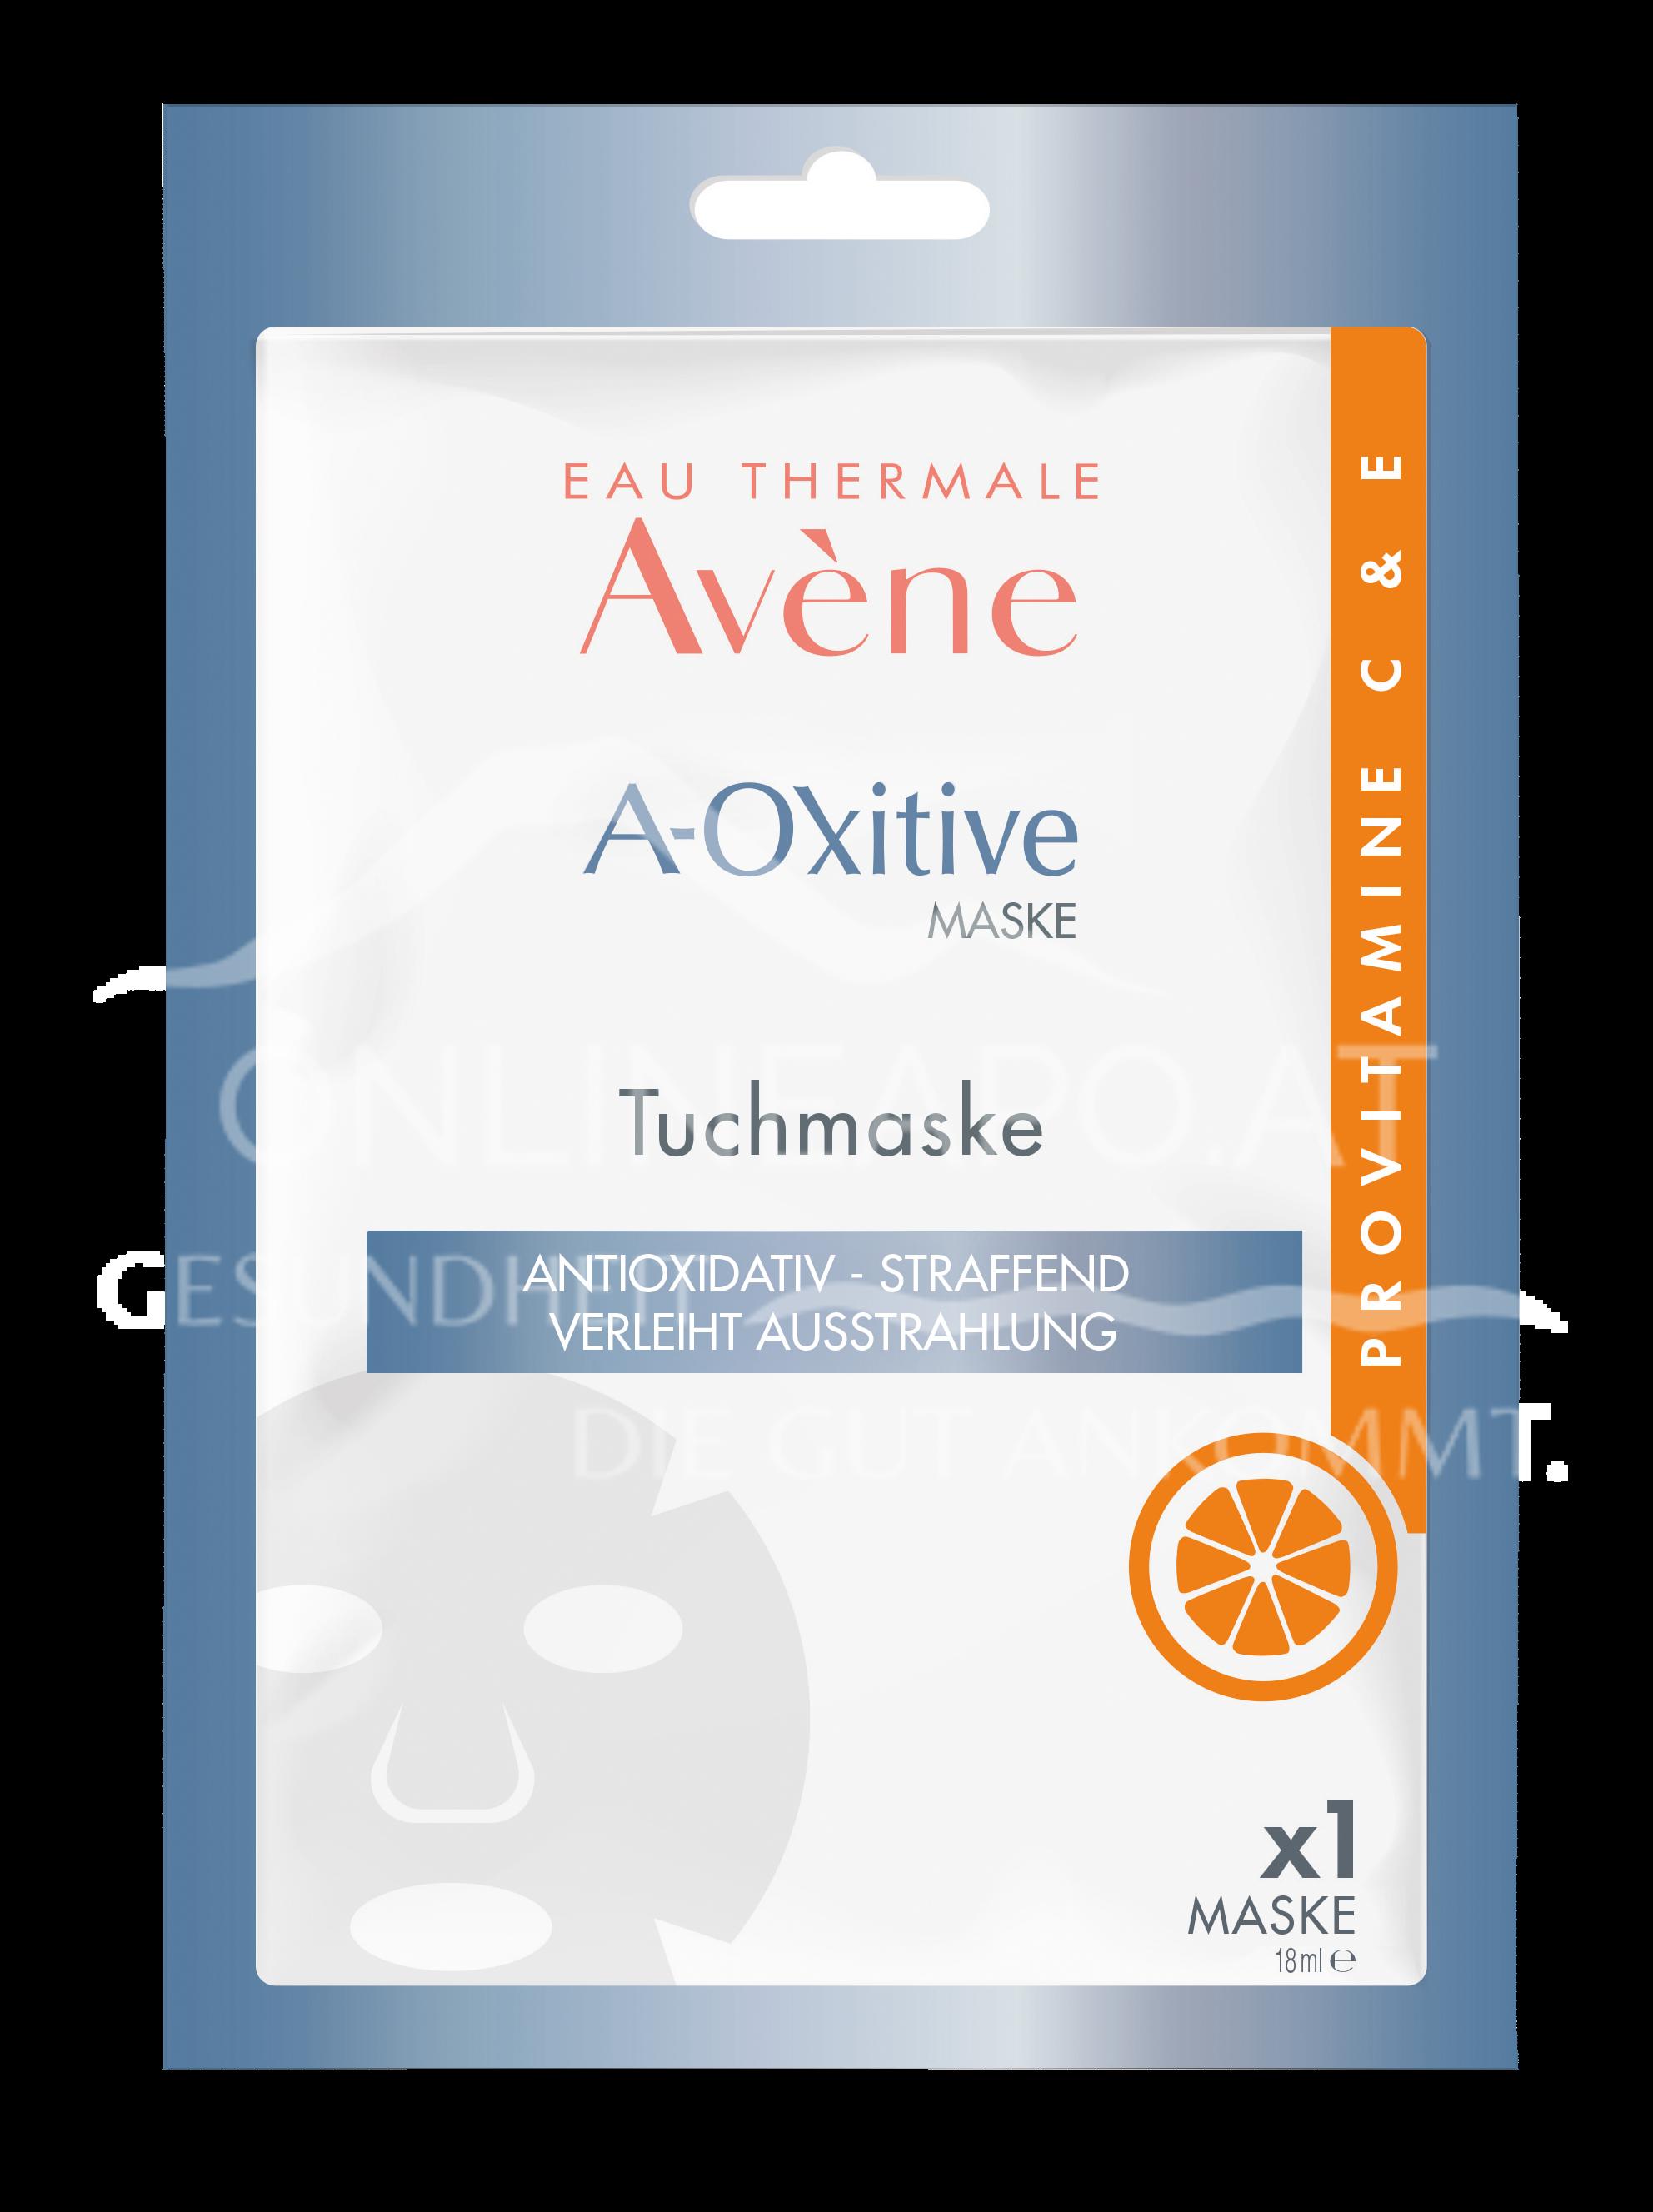 Avene A-OXitive Tuchmaske